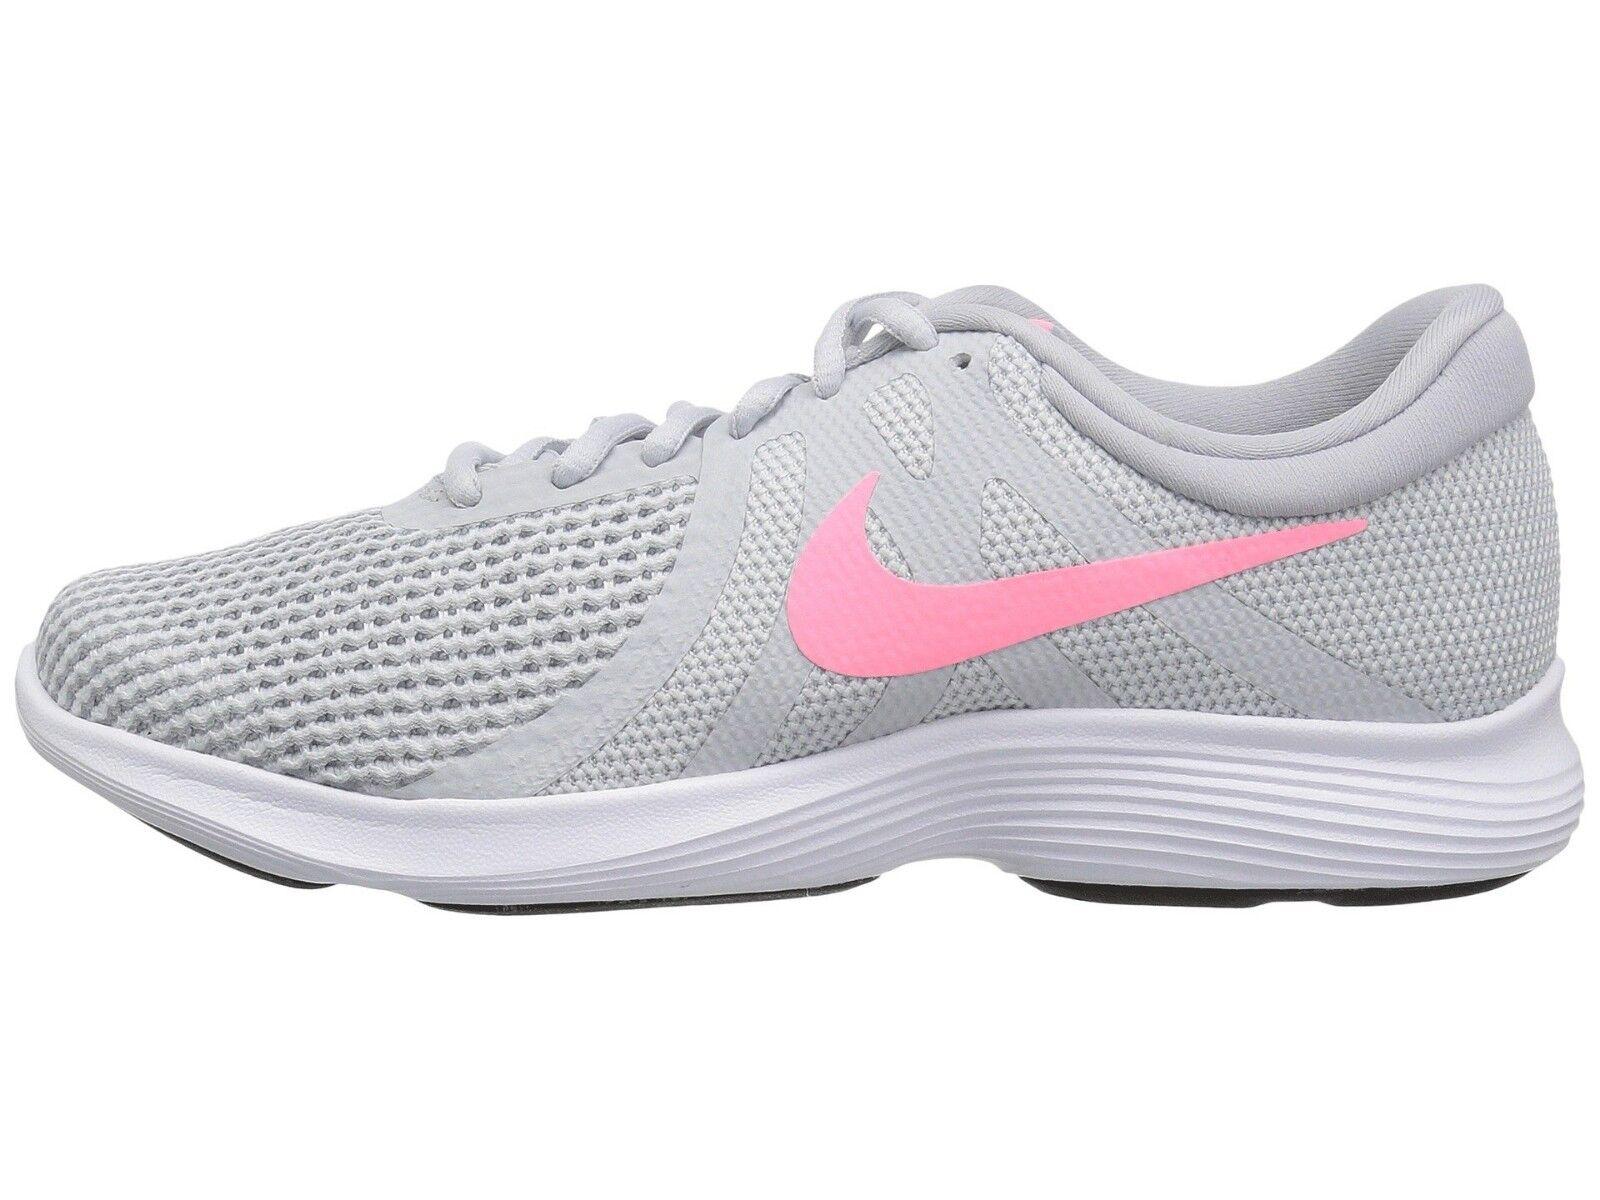 Nike Women's Revolution 4 Shoes Gray